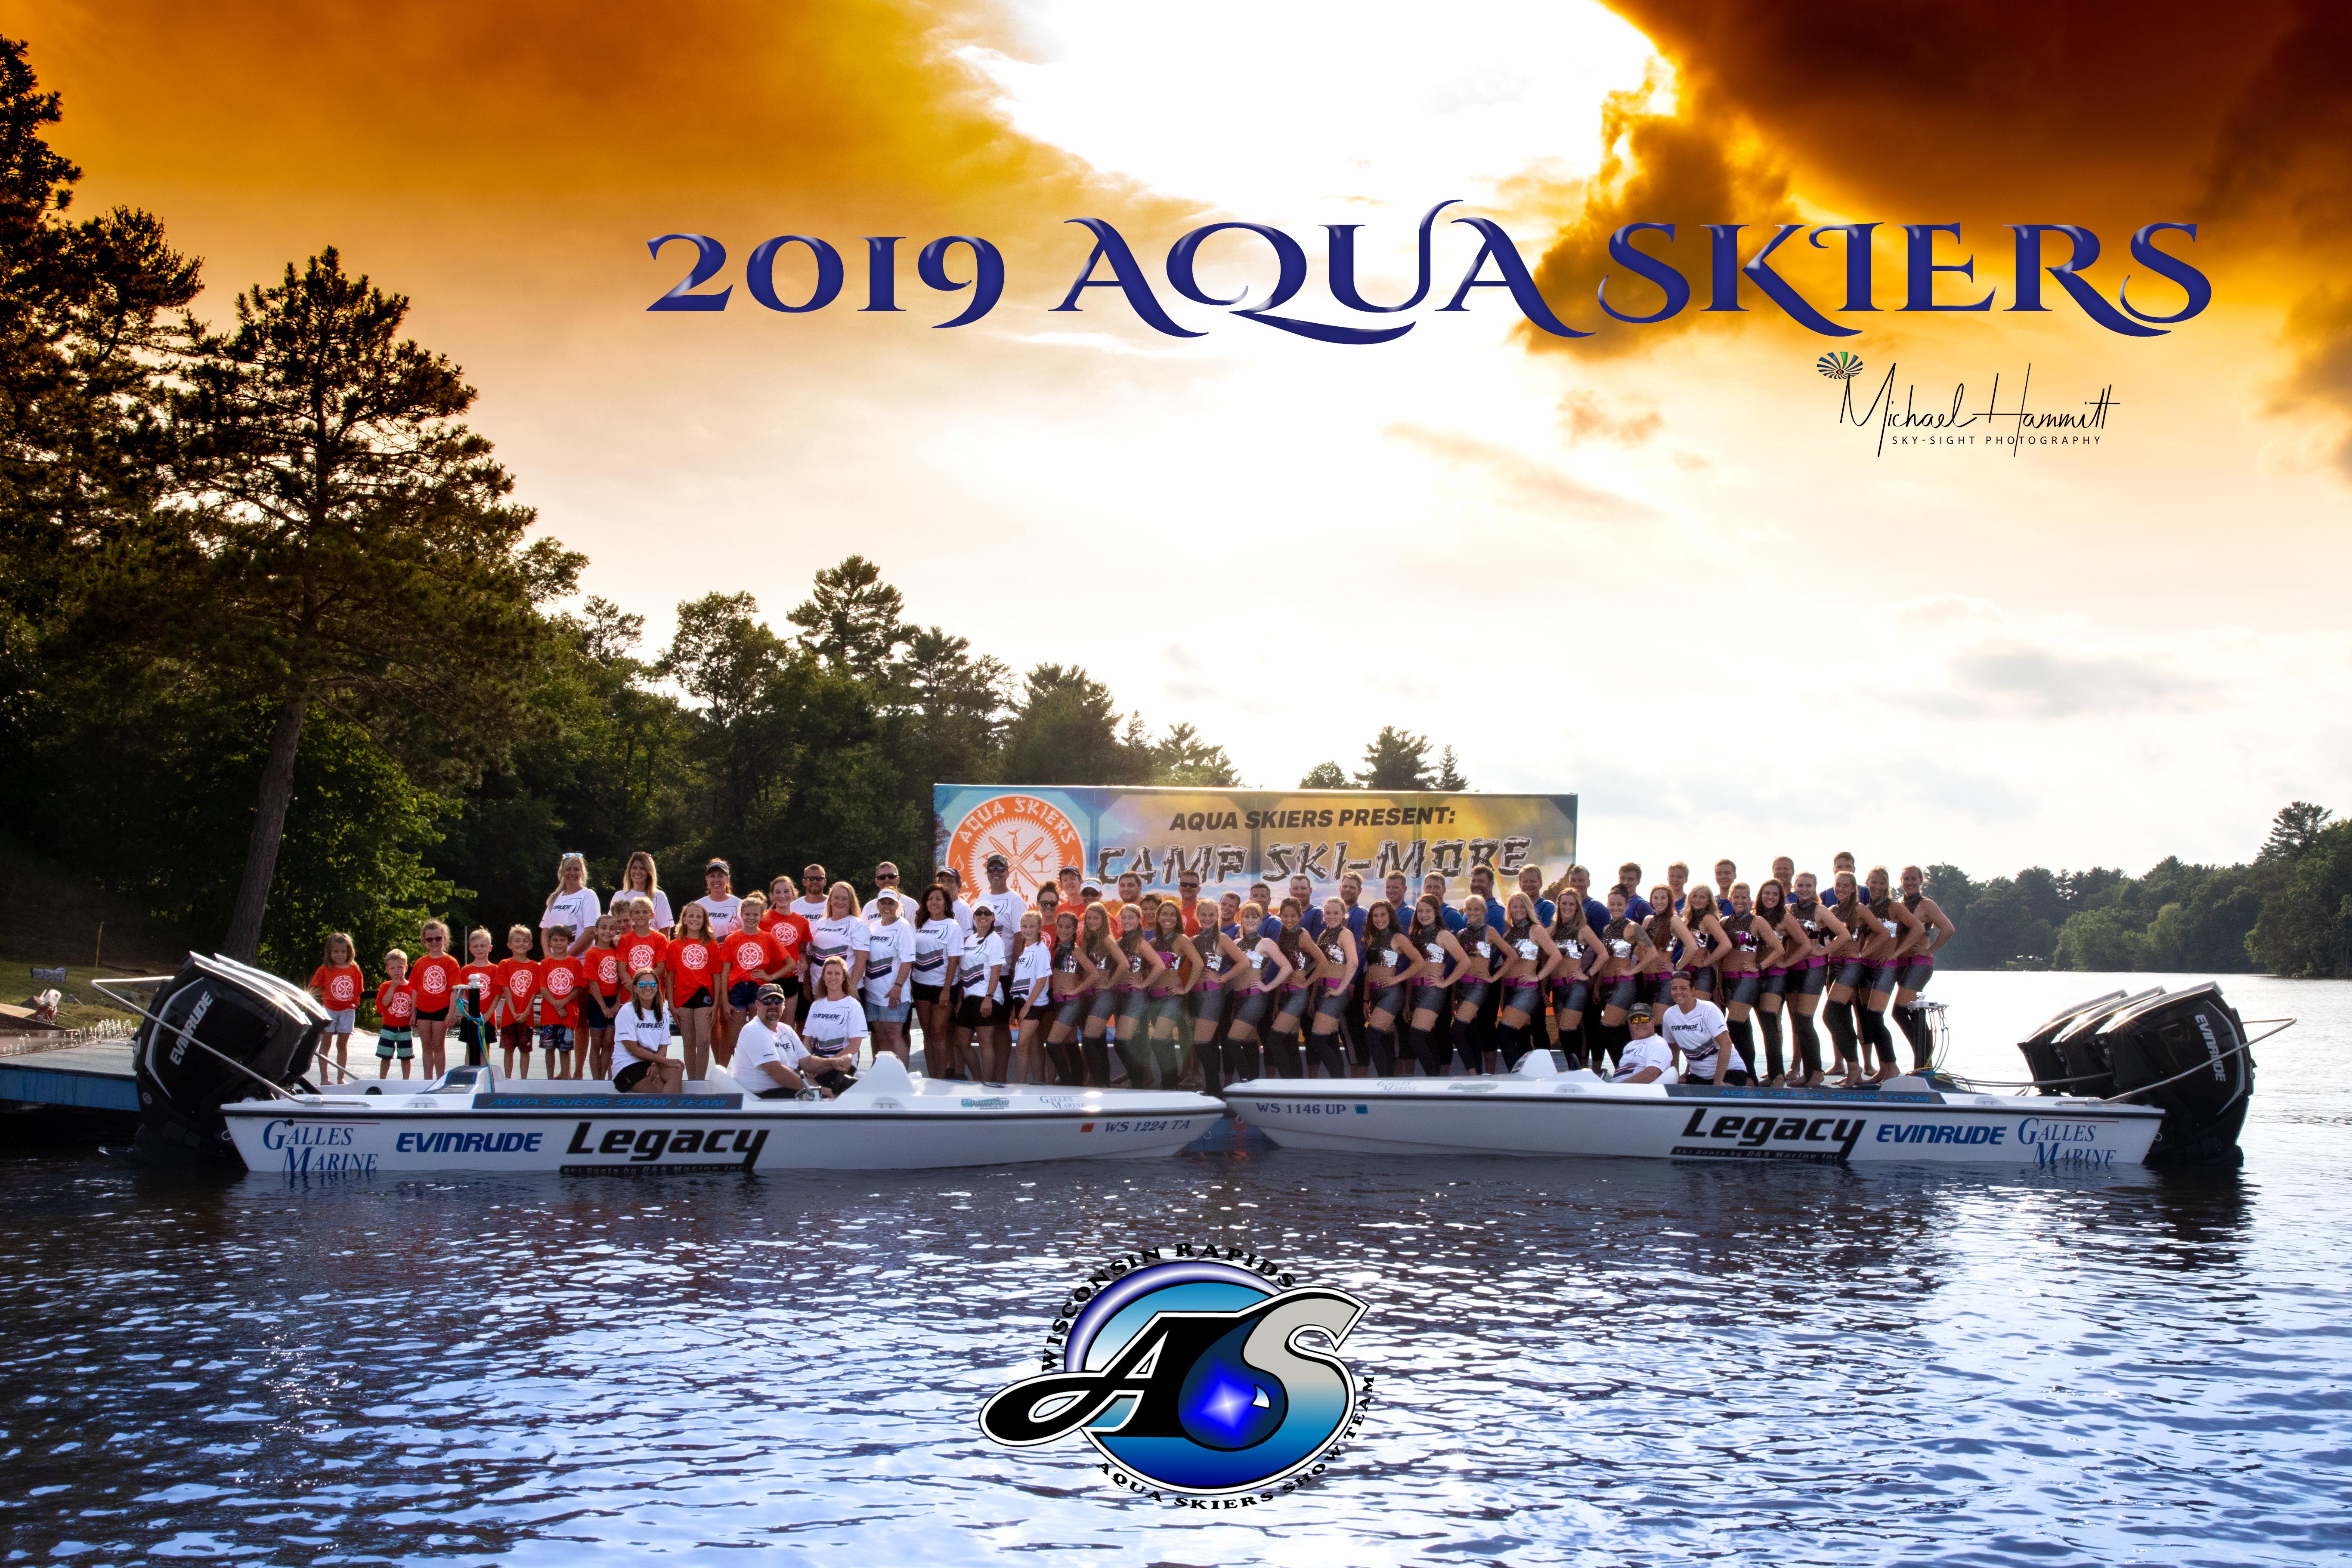 Aqua Skiers 2019